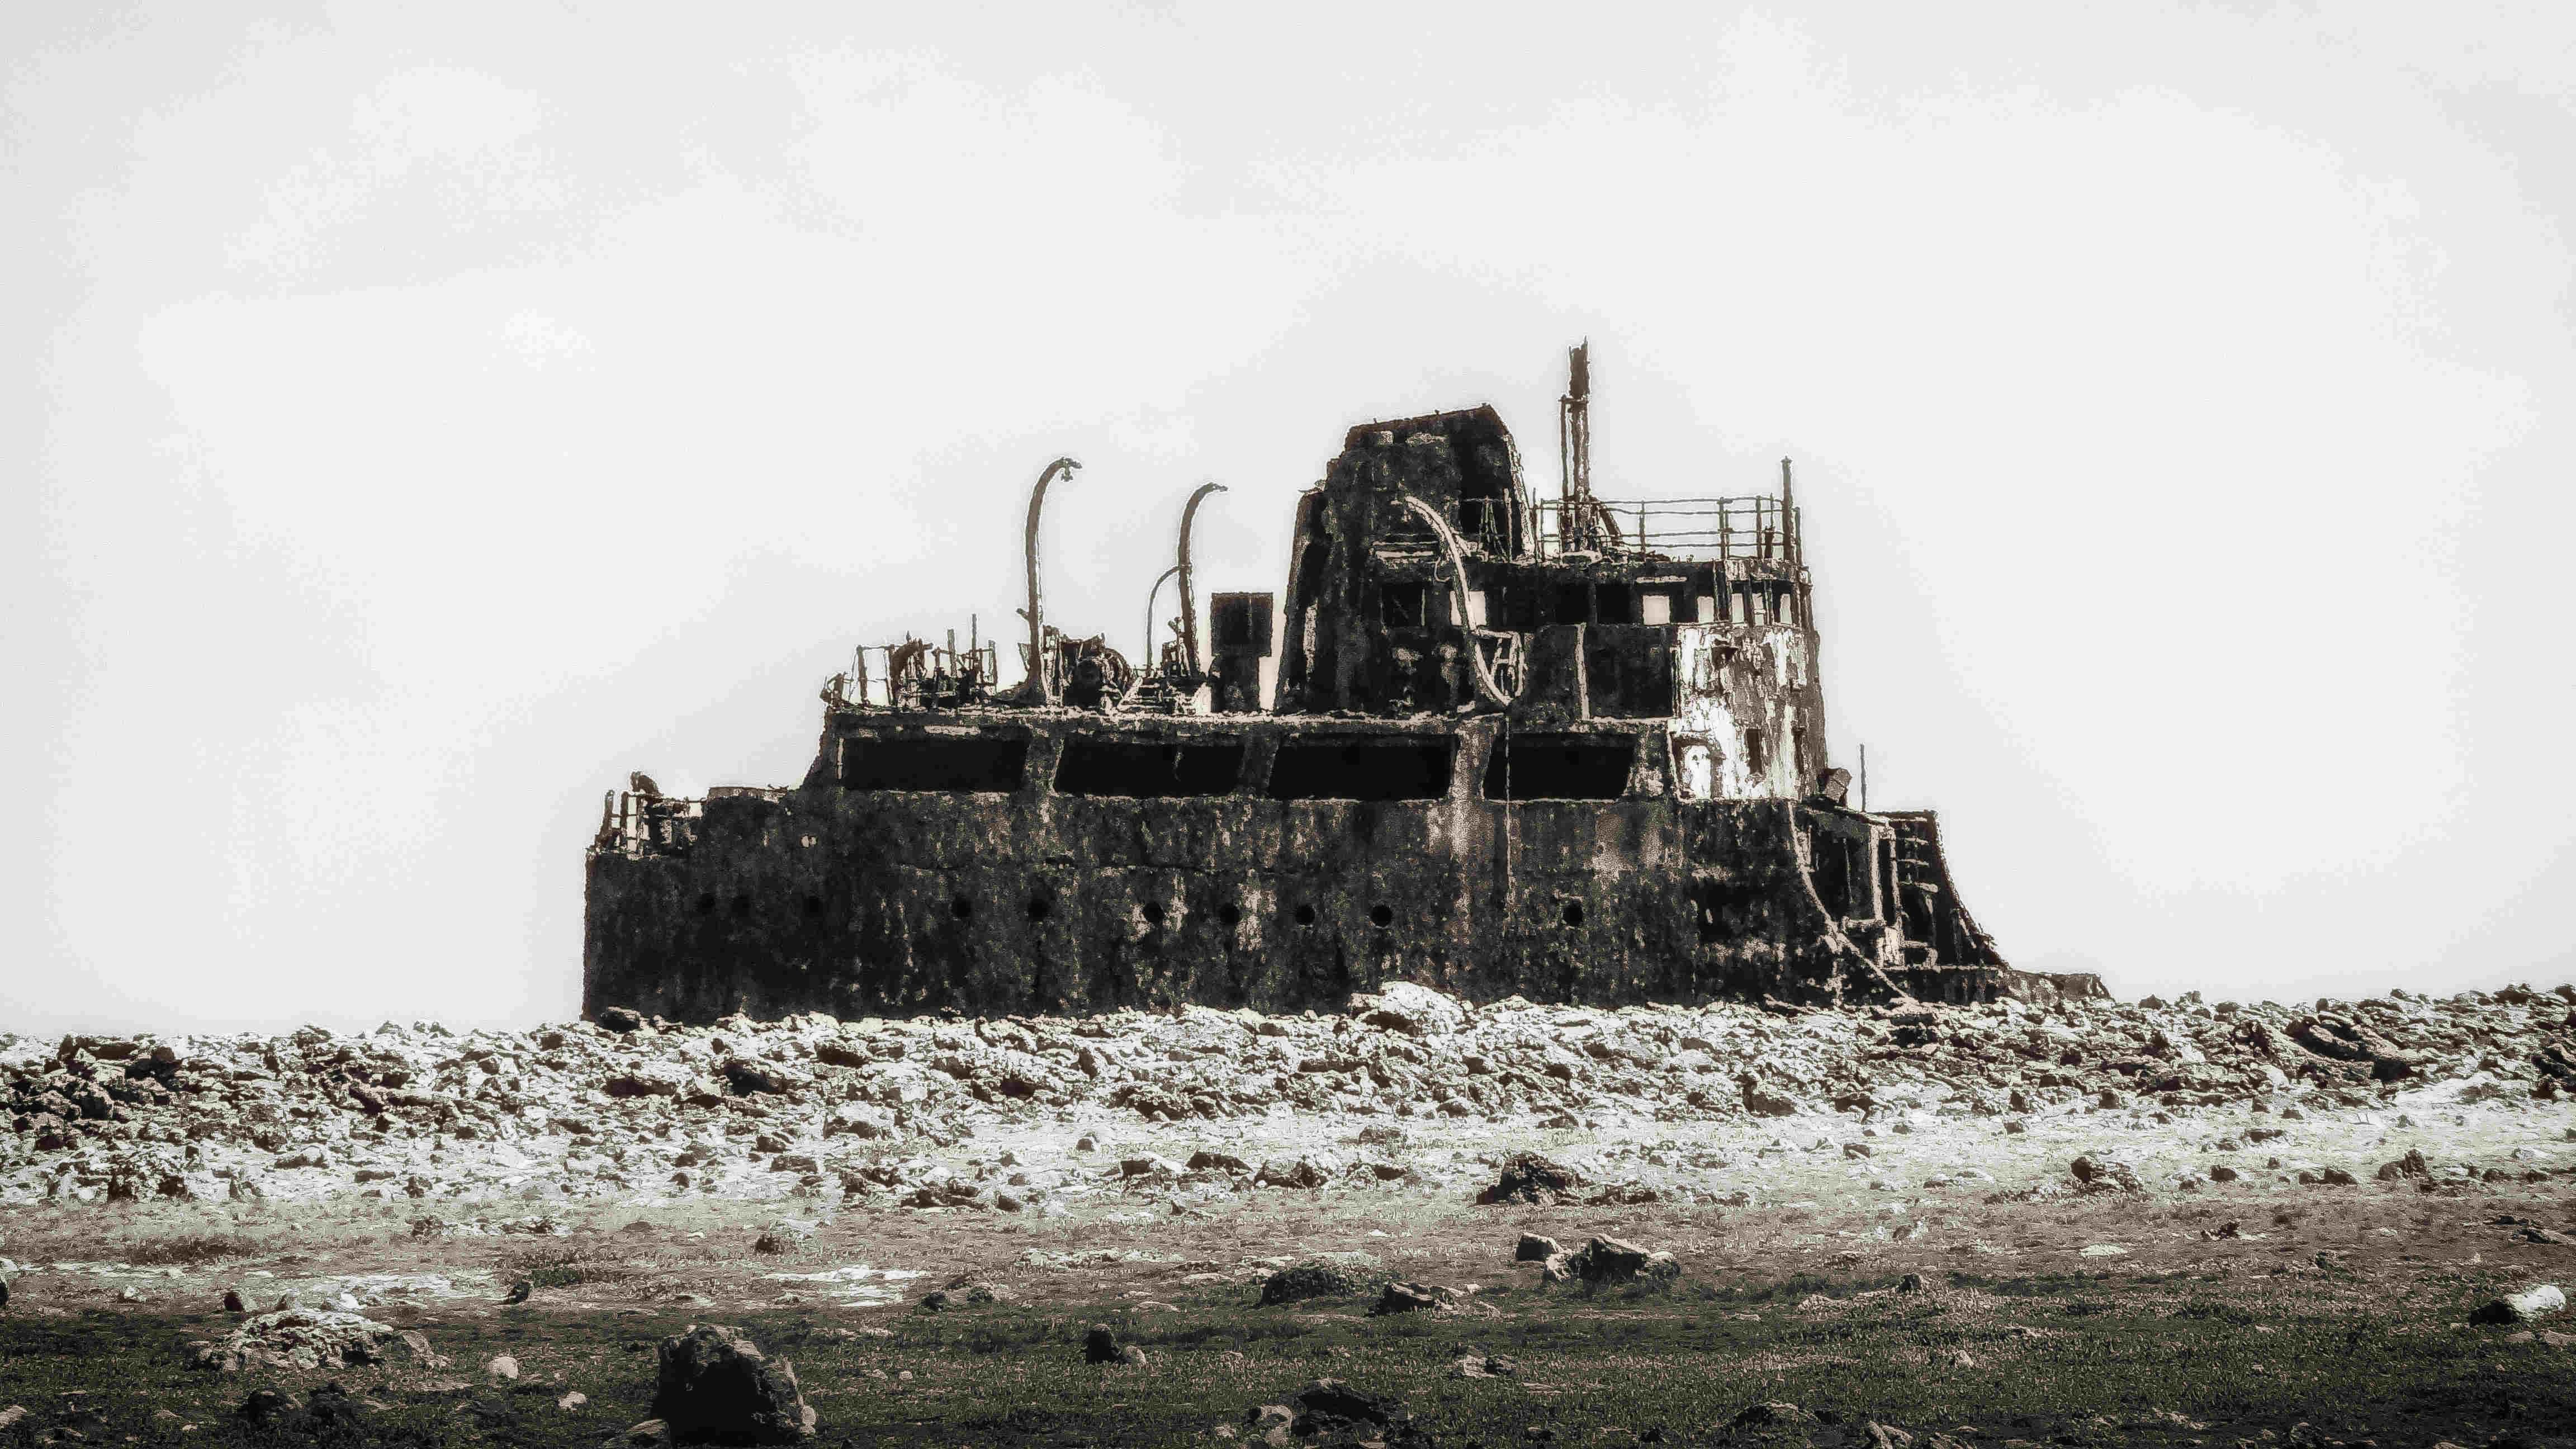 curacao-schiffswrack-ruine-lost places raffenerie shell konzern